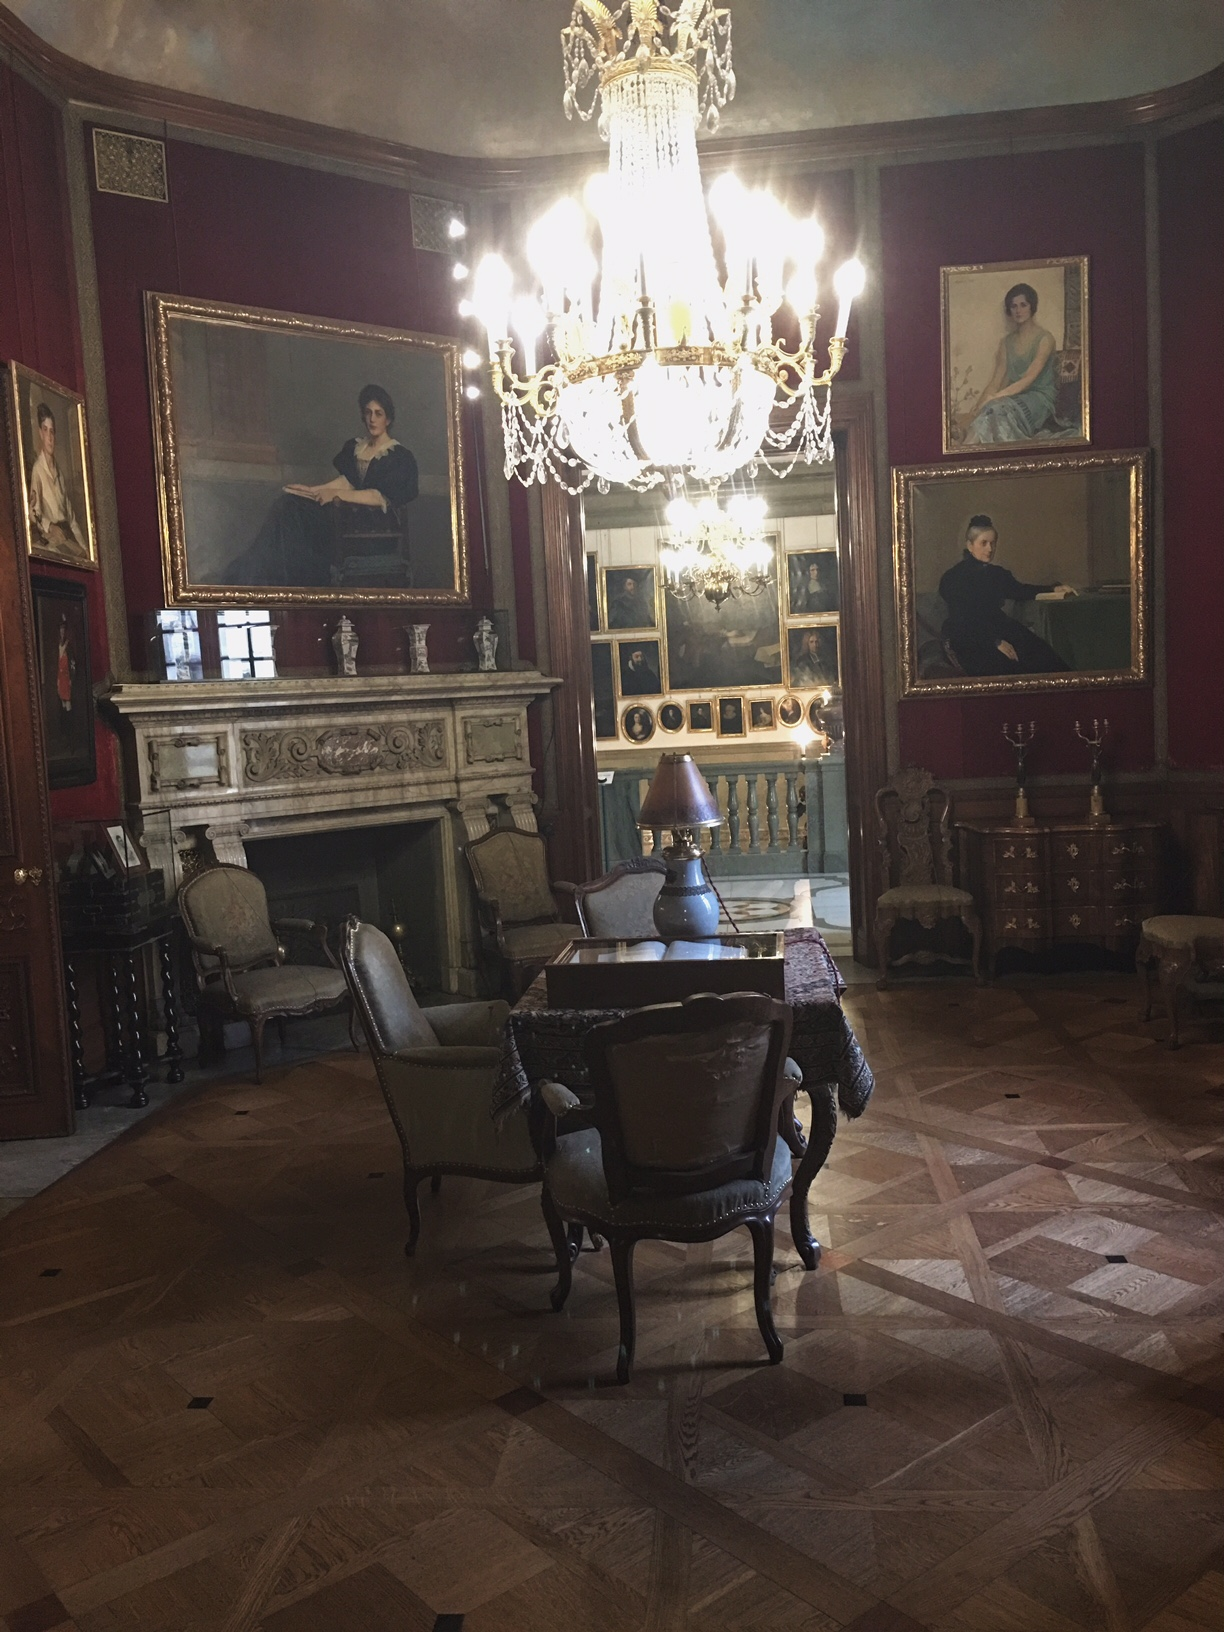 #hallwylska#palats#stockholm#inredningsblogg#joelhome